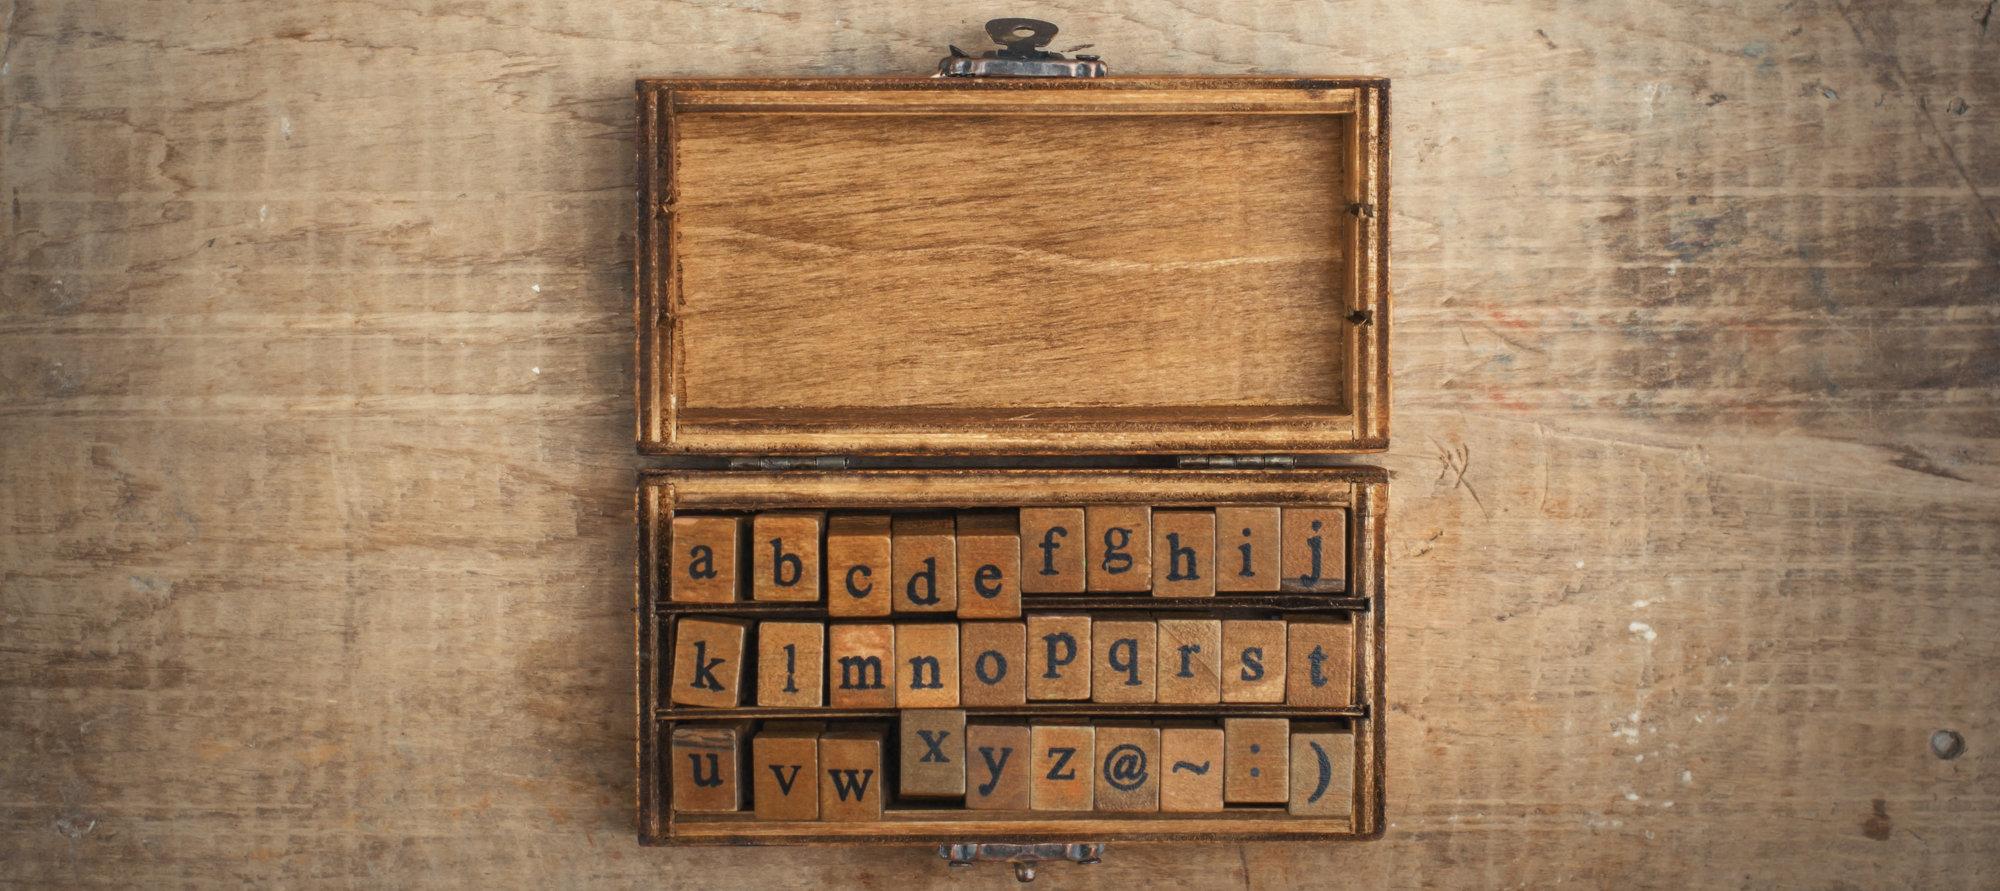 wooden stamps alphabet in old vintage box on grunge background